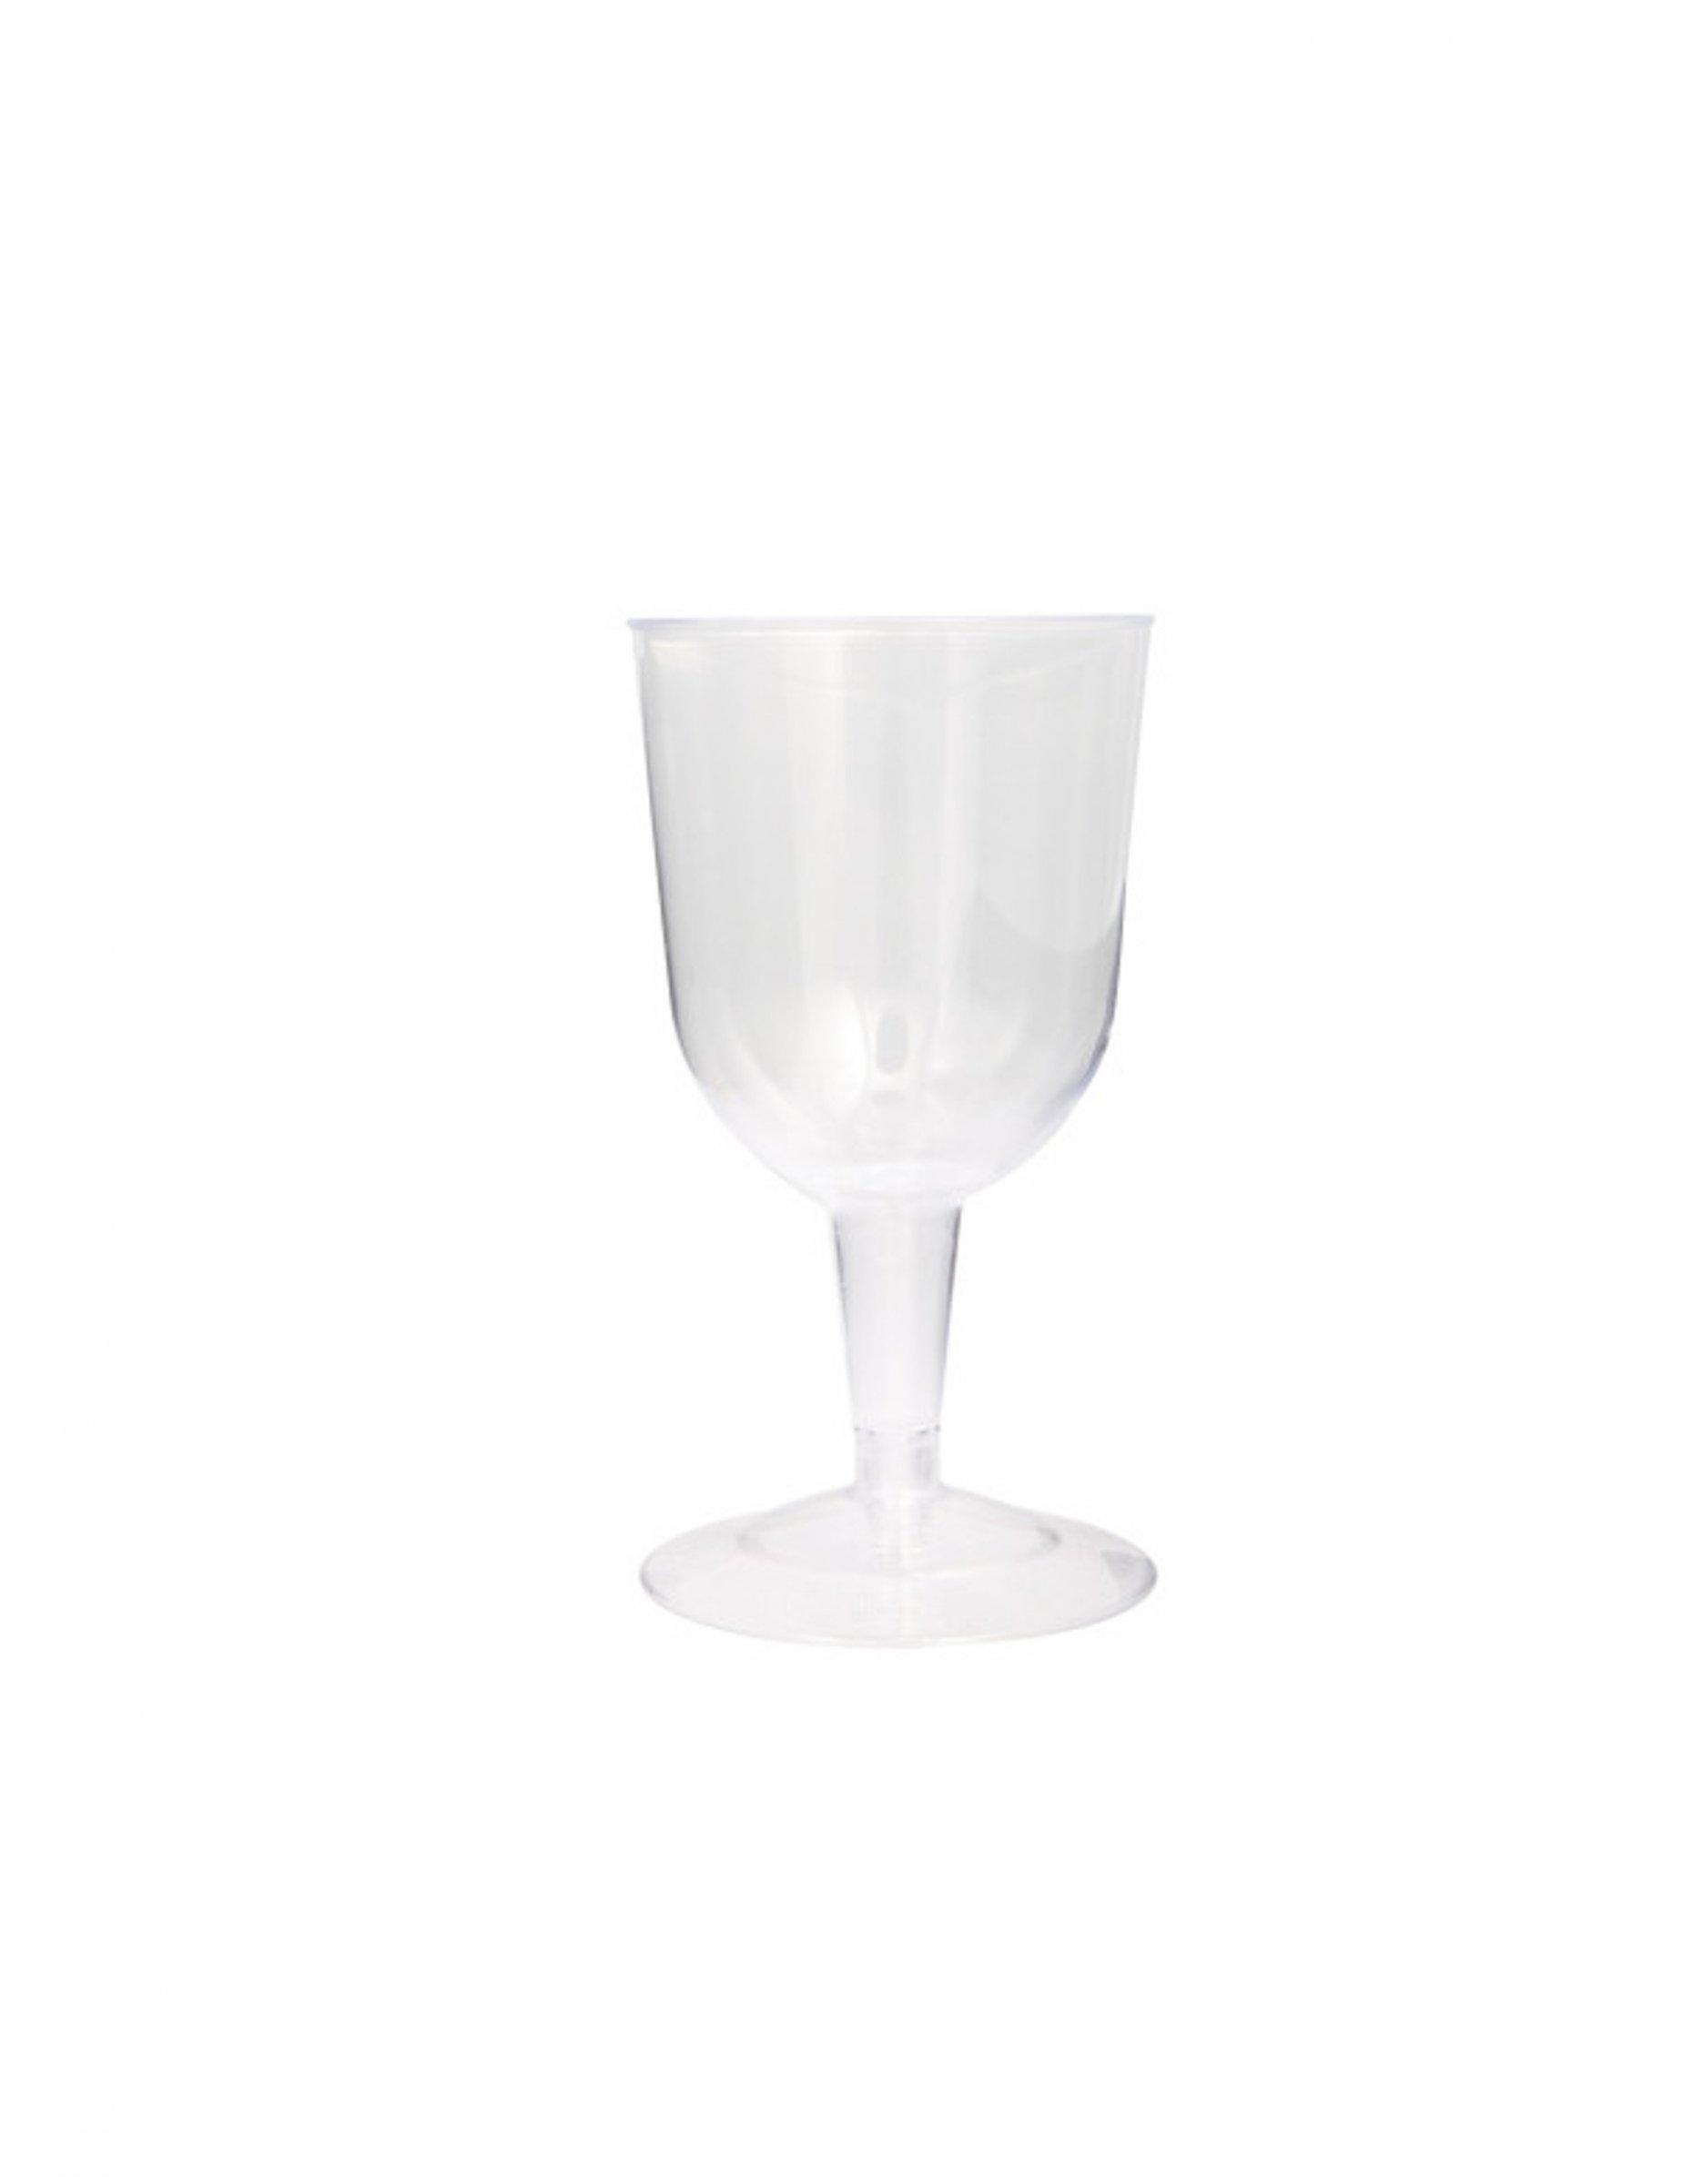 6 verres pied plastique transparent 200 ml d coration. Black Bedroom Furniture Sets. Home Design Ideas